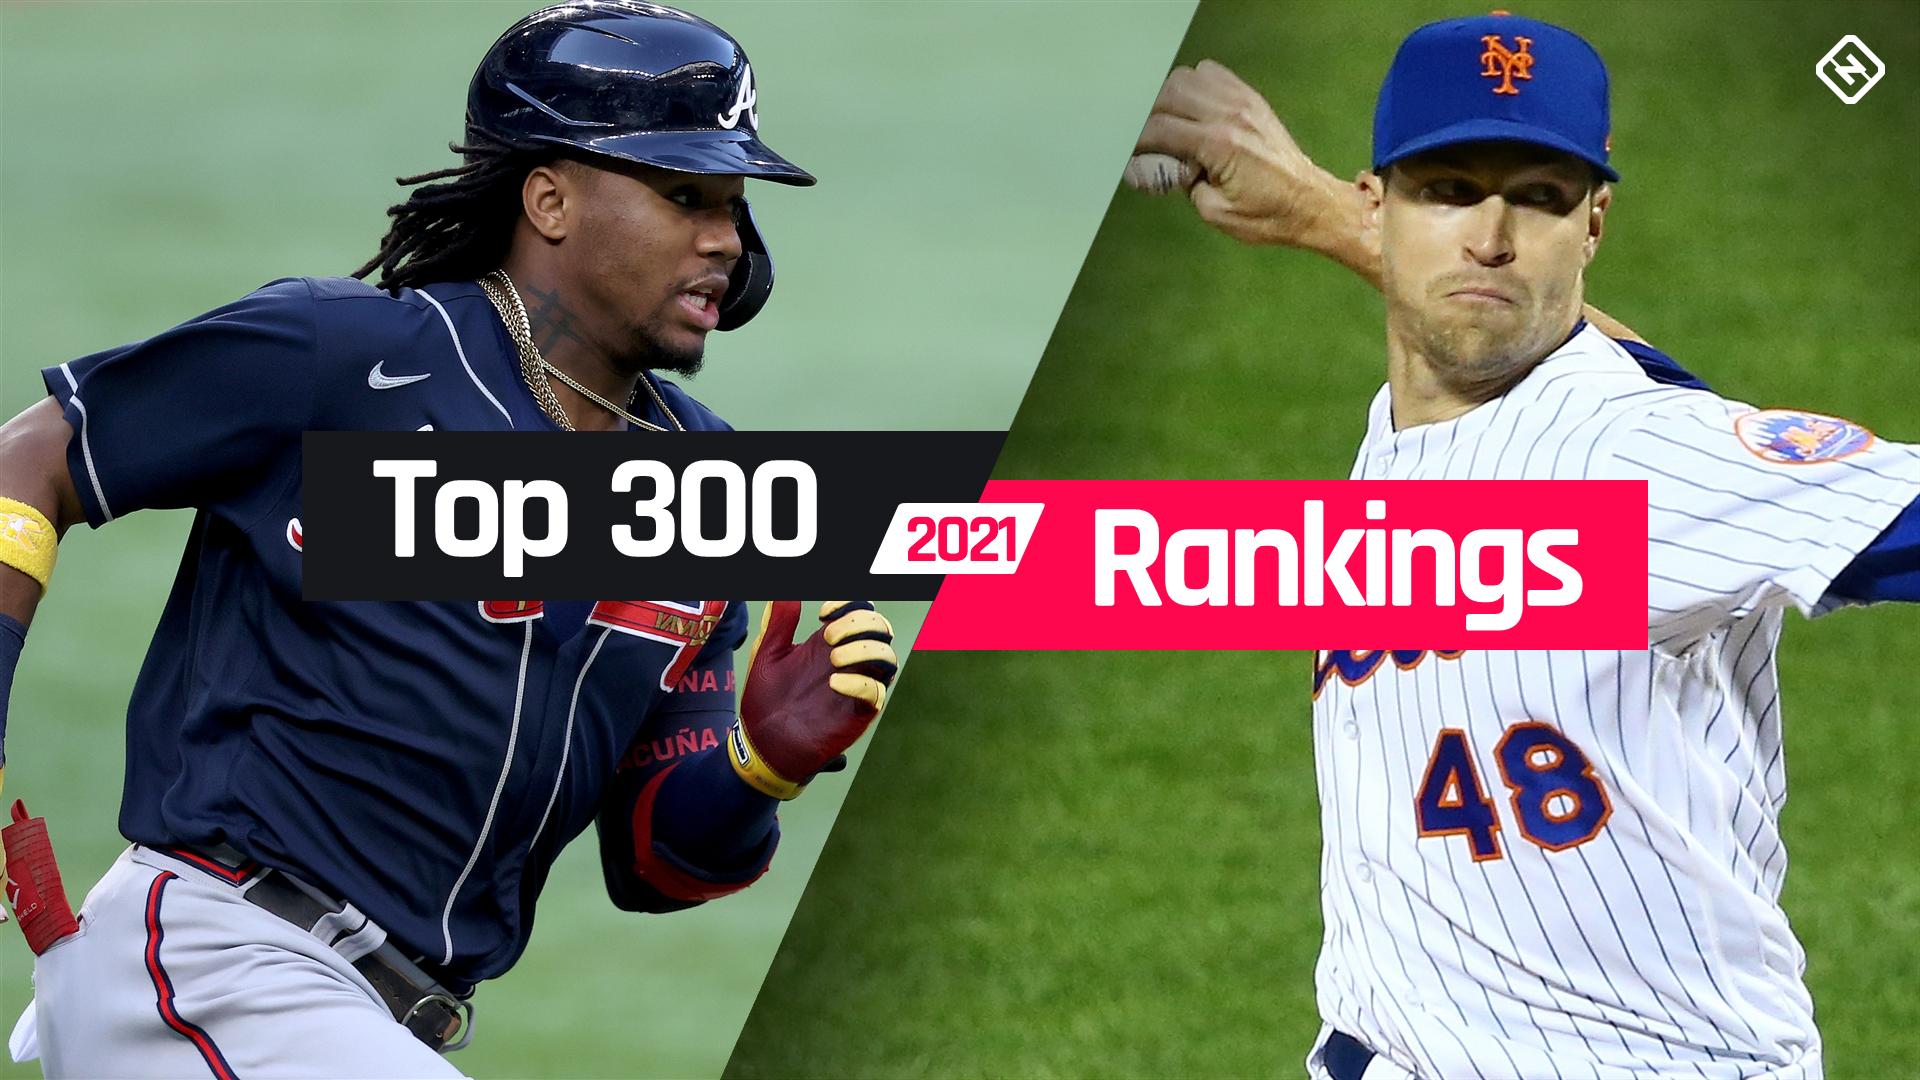 Fantasy Baseball Rankings: Top 300 cheat sheet for 2021